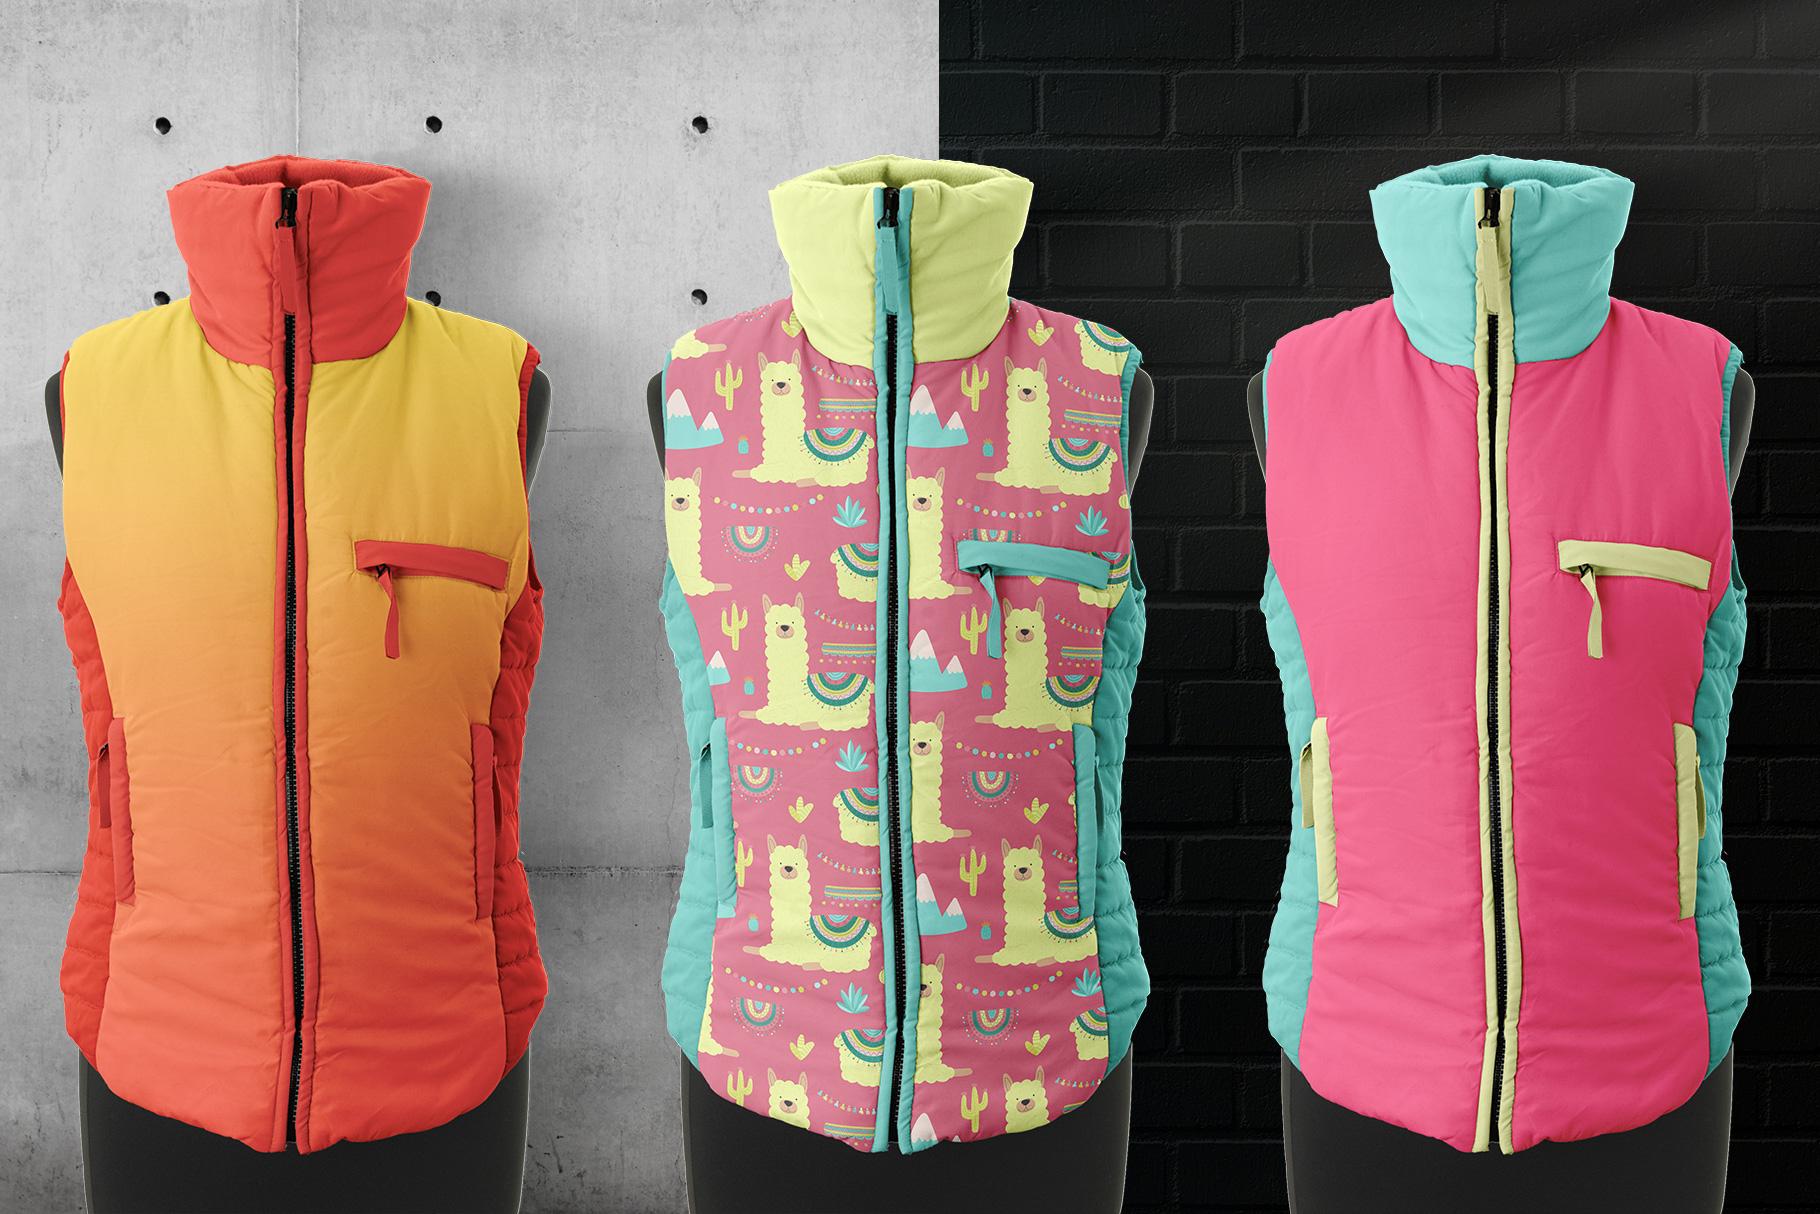 background options of the women's sleeveless winter jacket mockup